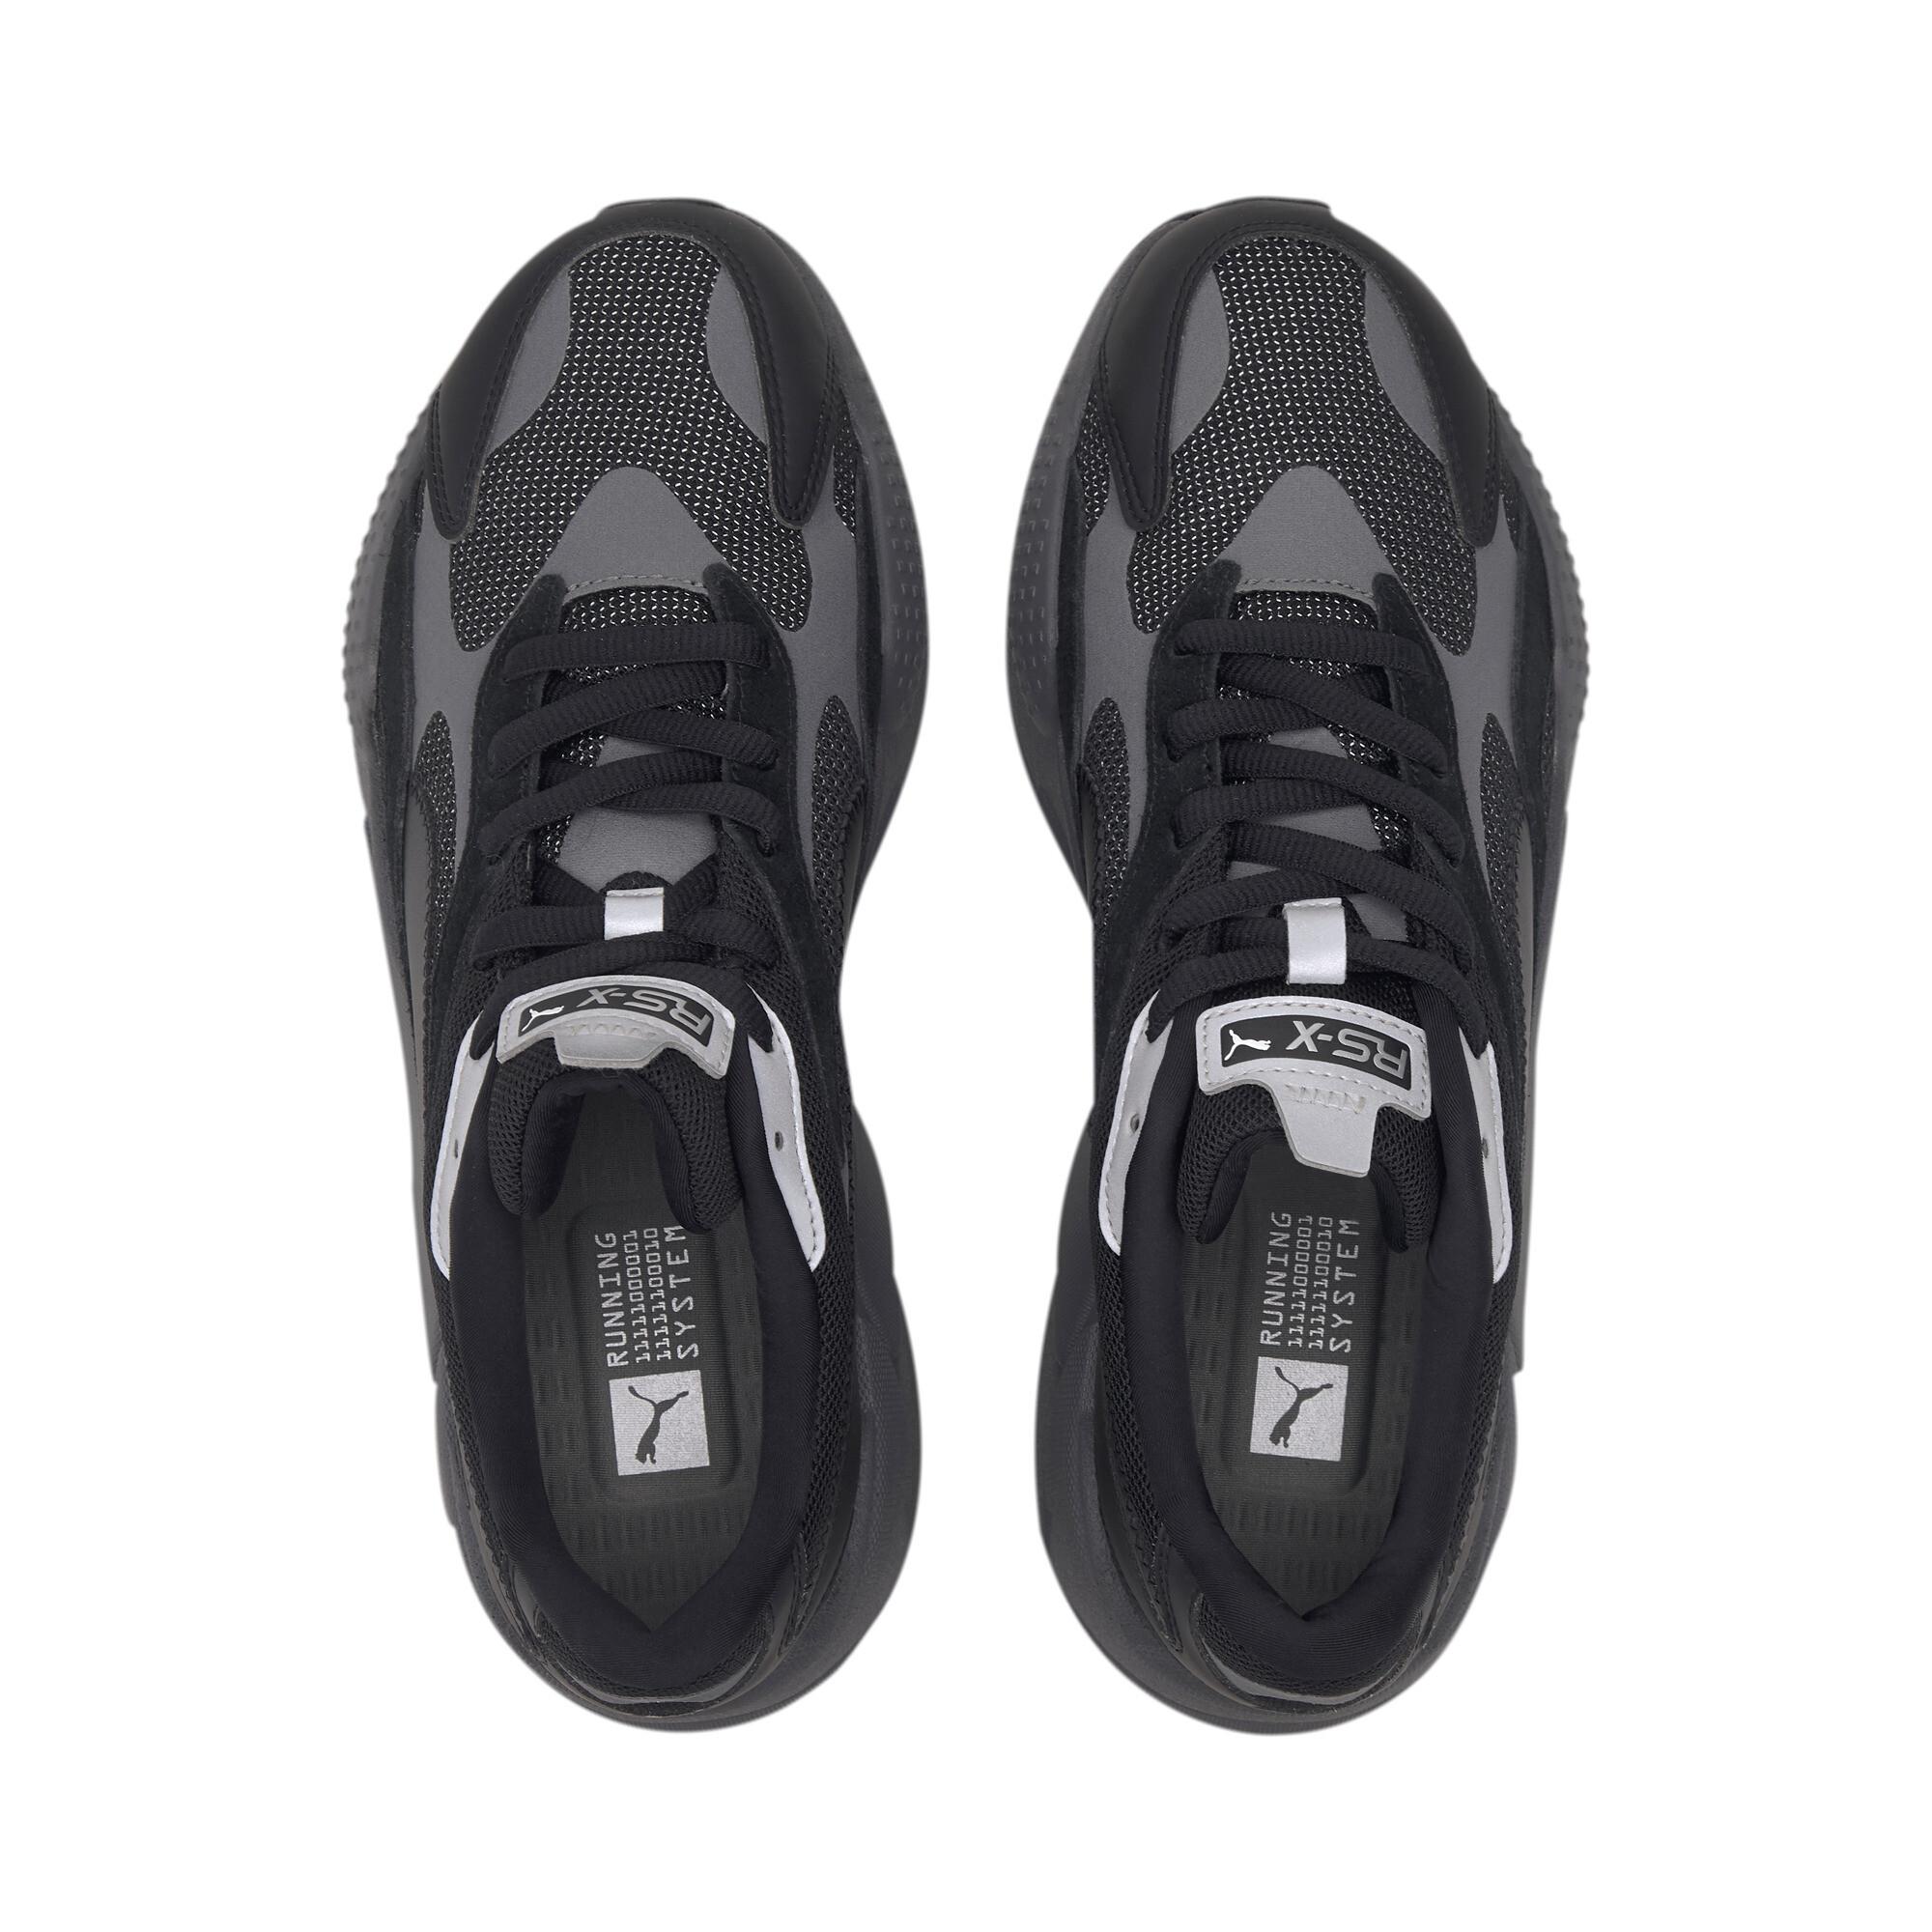 PUMA-Men-039-s-RS-X-Puzzle-Sneakers thumbnail 27